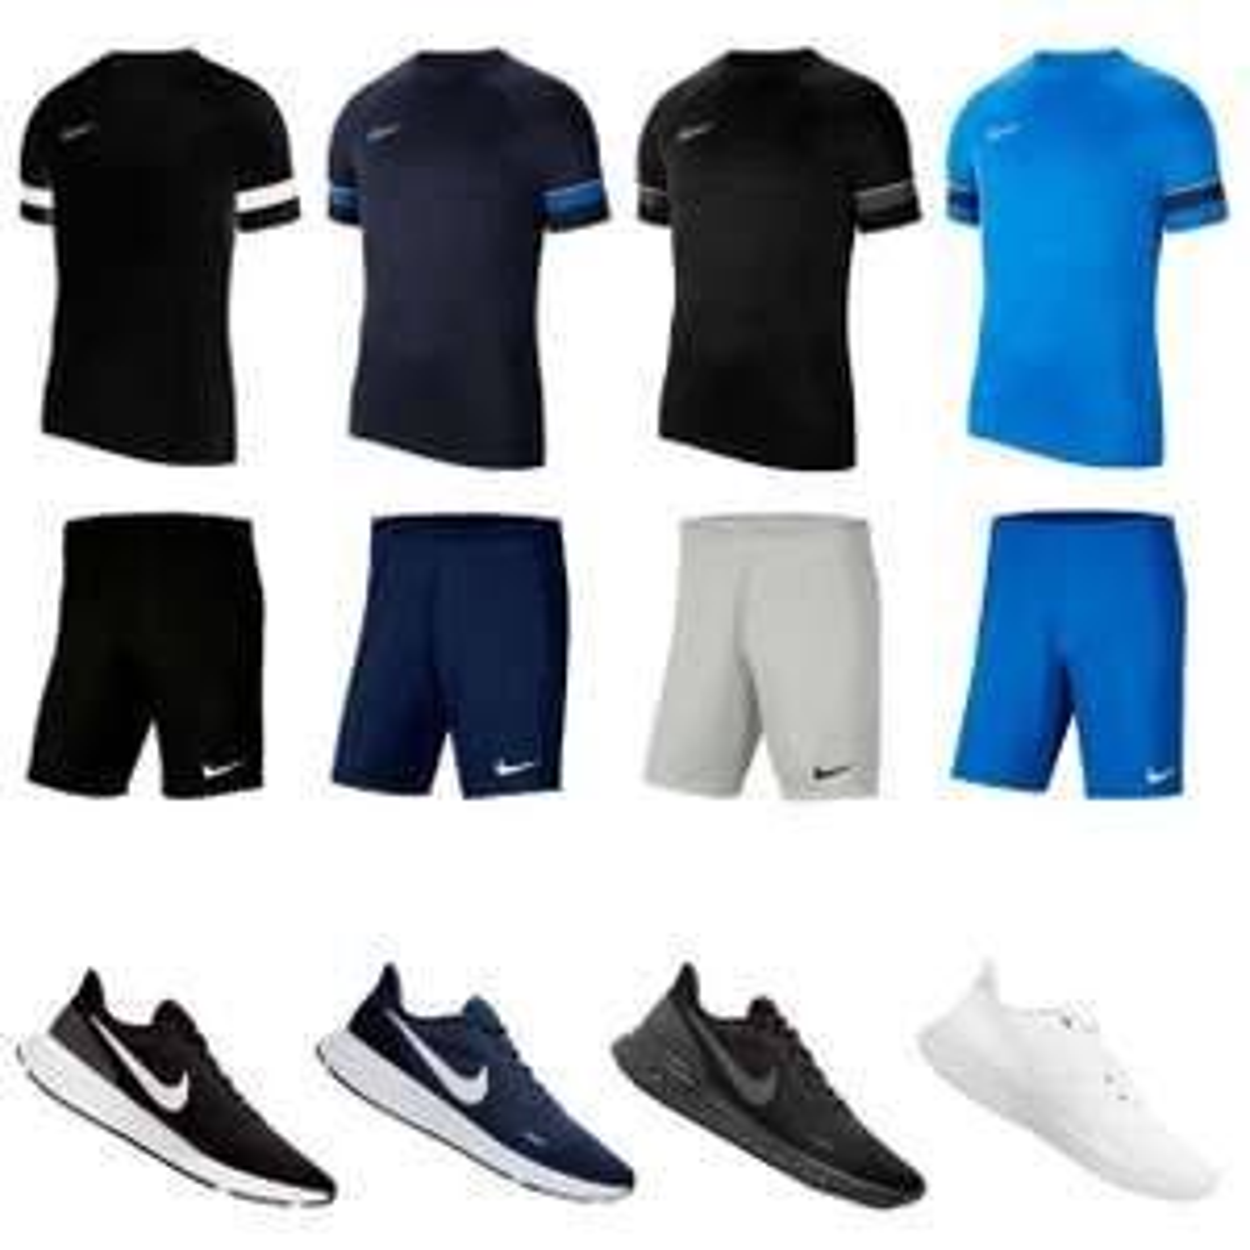 Nike 3-delige sportset INCLUSIEF schoenen - Mix & Match